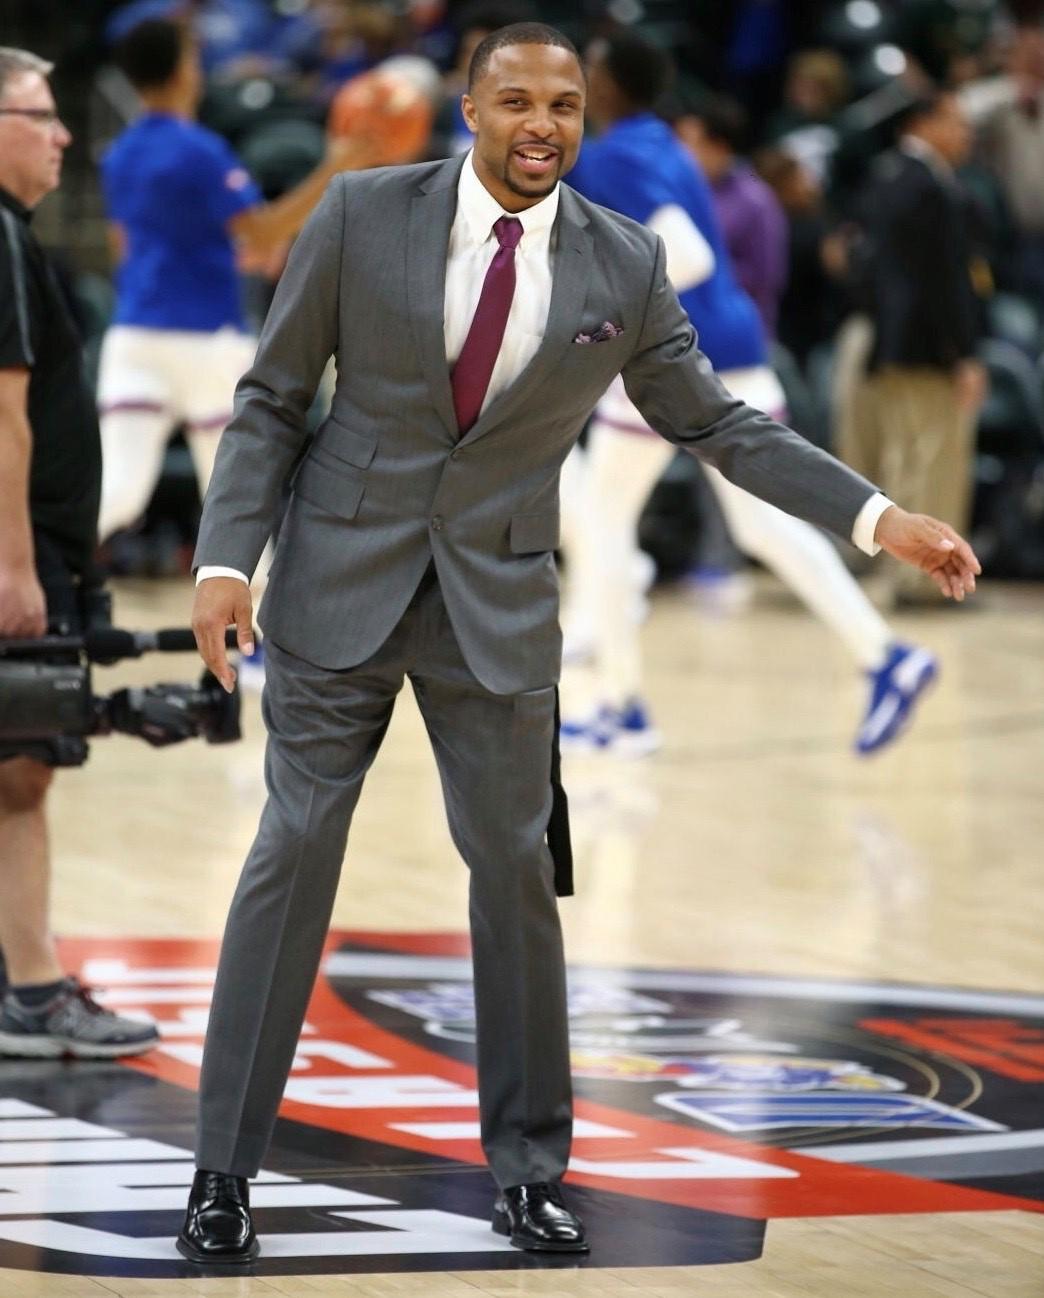 Chris Fowler Announced Assistant Coach Of Northern Arizona Men's Basketball | Doug Wojcik